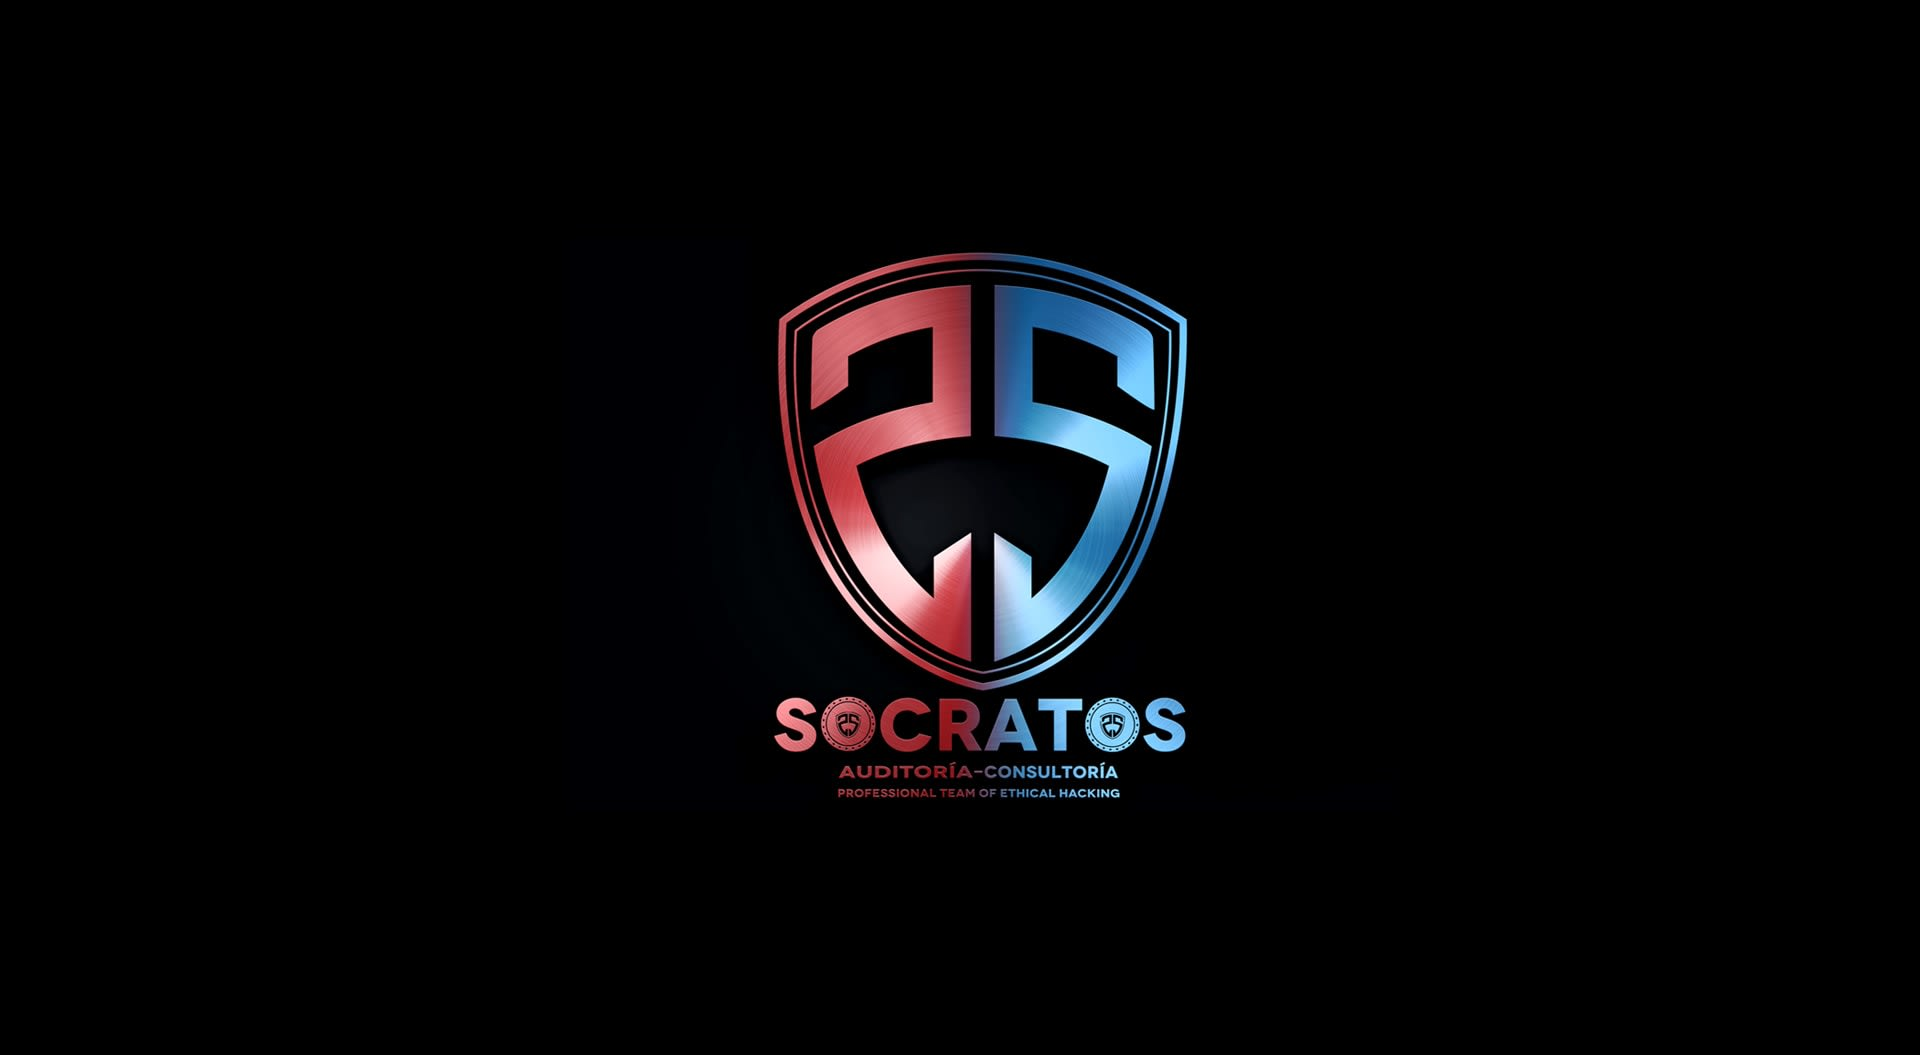 Socratos Security